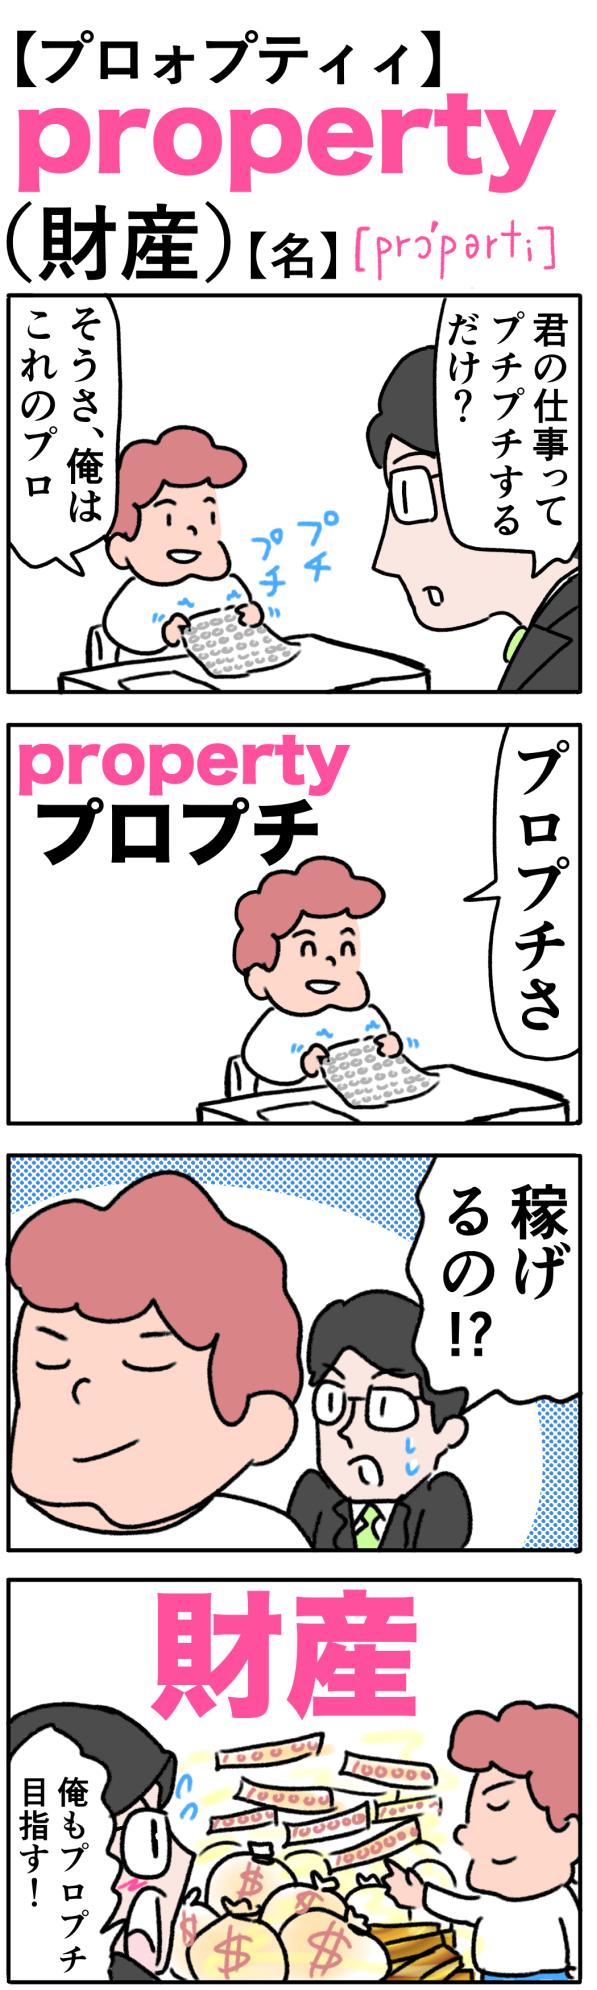 property(財産)の語呂合わせ英単語